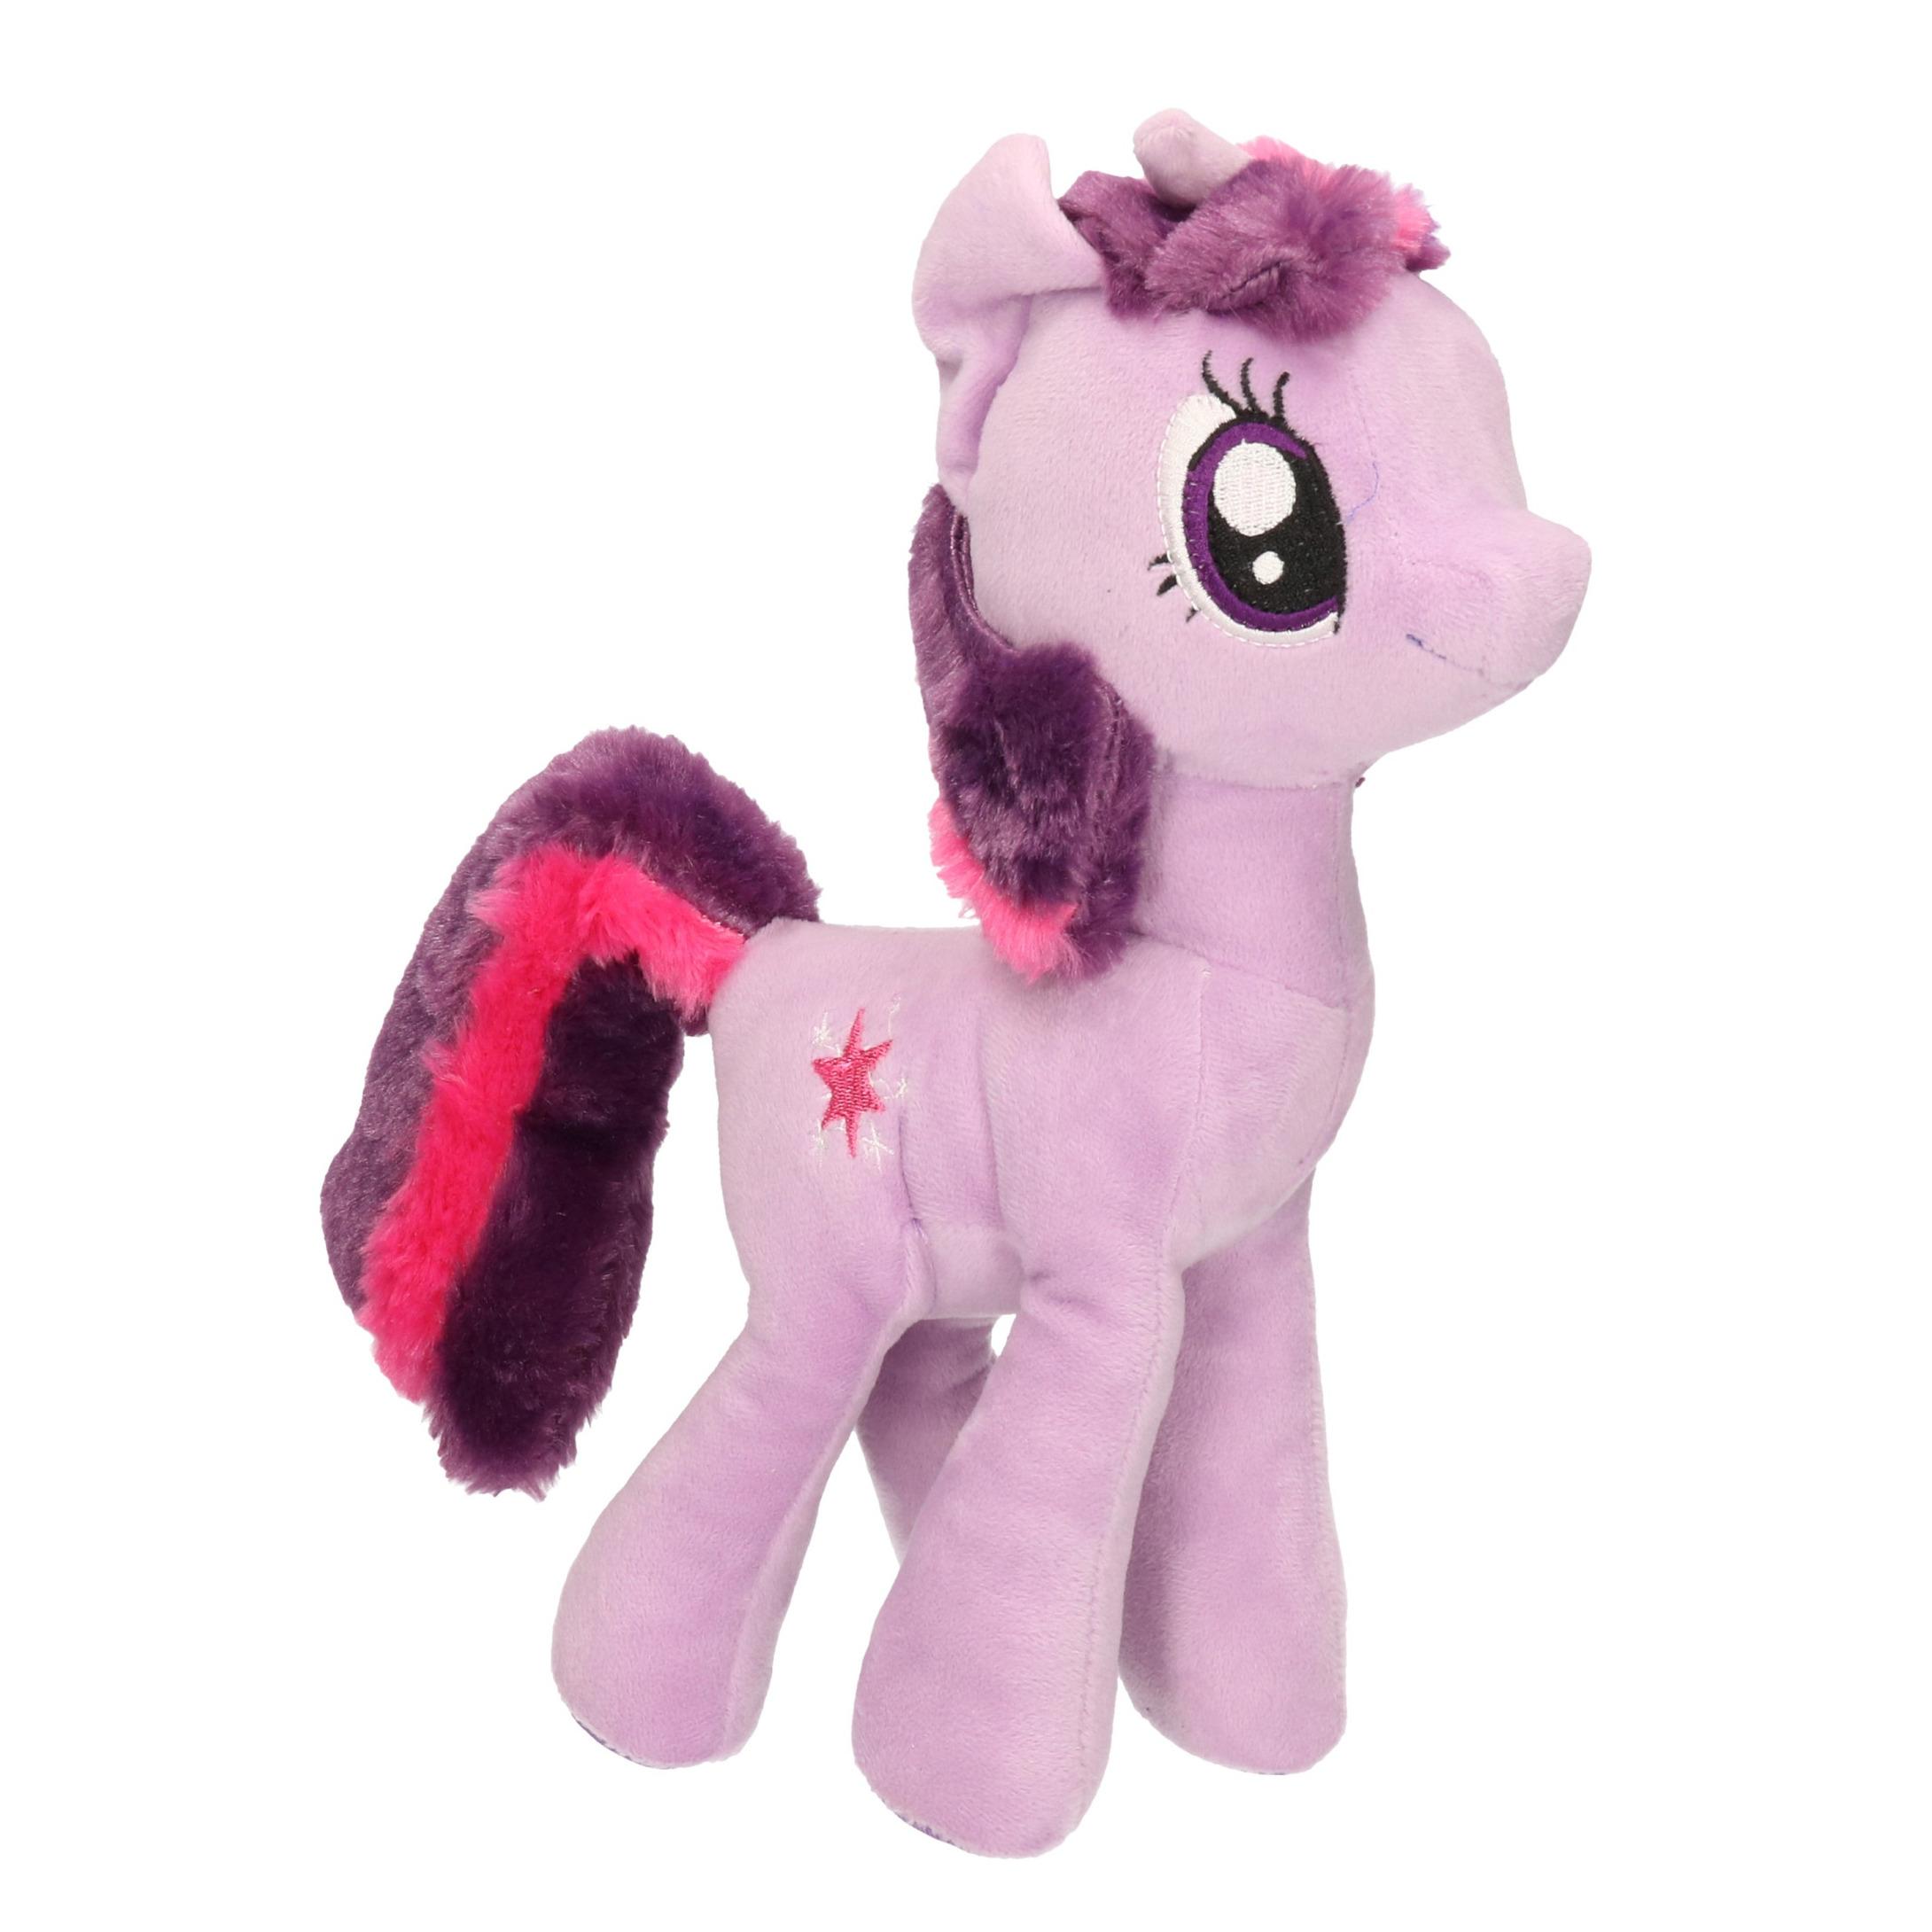 Lila/paarse My Little Pony knuffels Twilight Sparkle 30 cm knuffeldieren